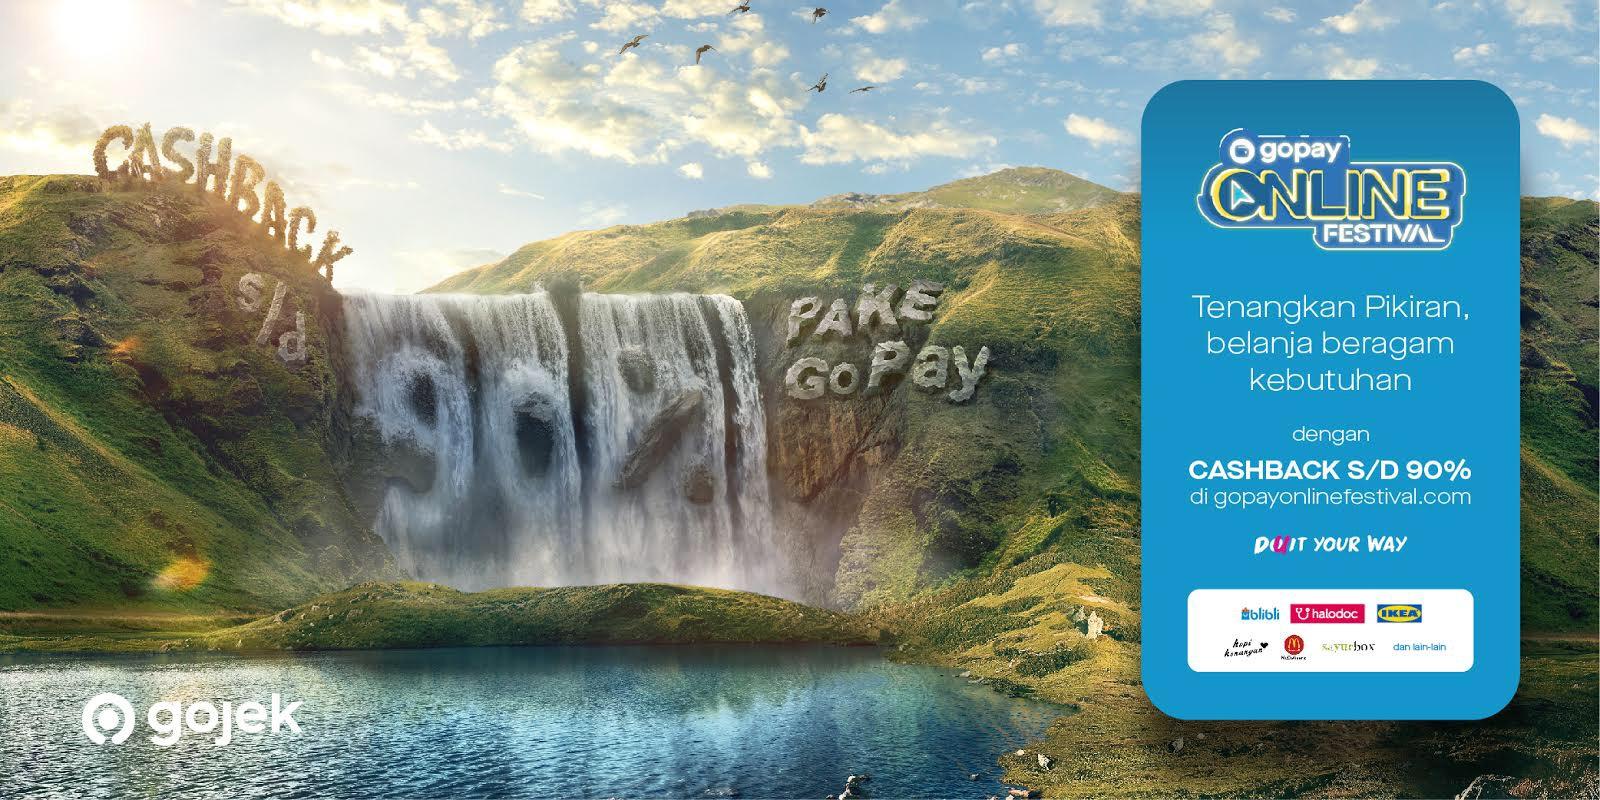 GoPay beri Cashback 90% di Harbolnas 11.11. Foto: GoPay